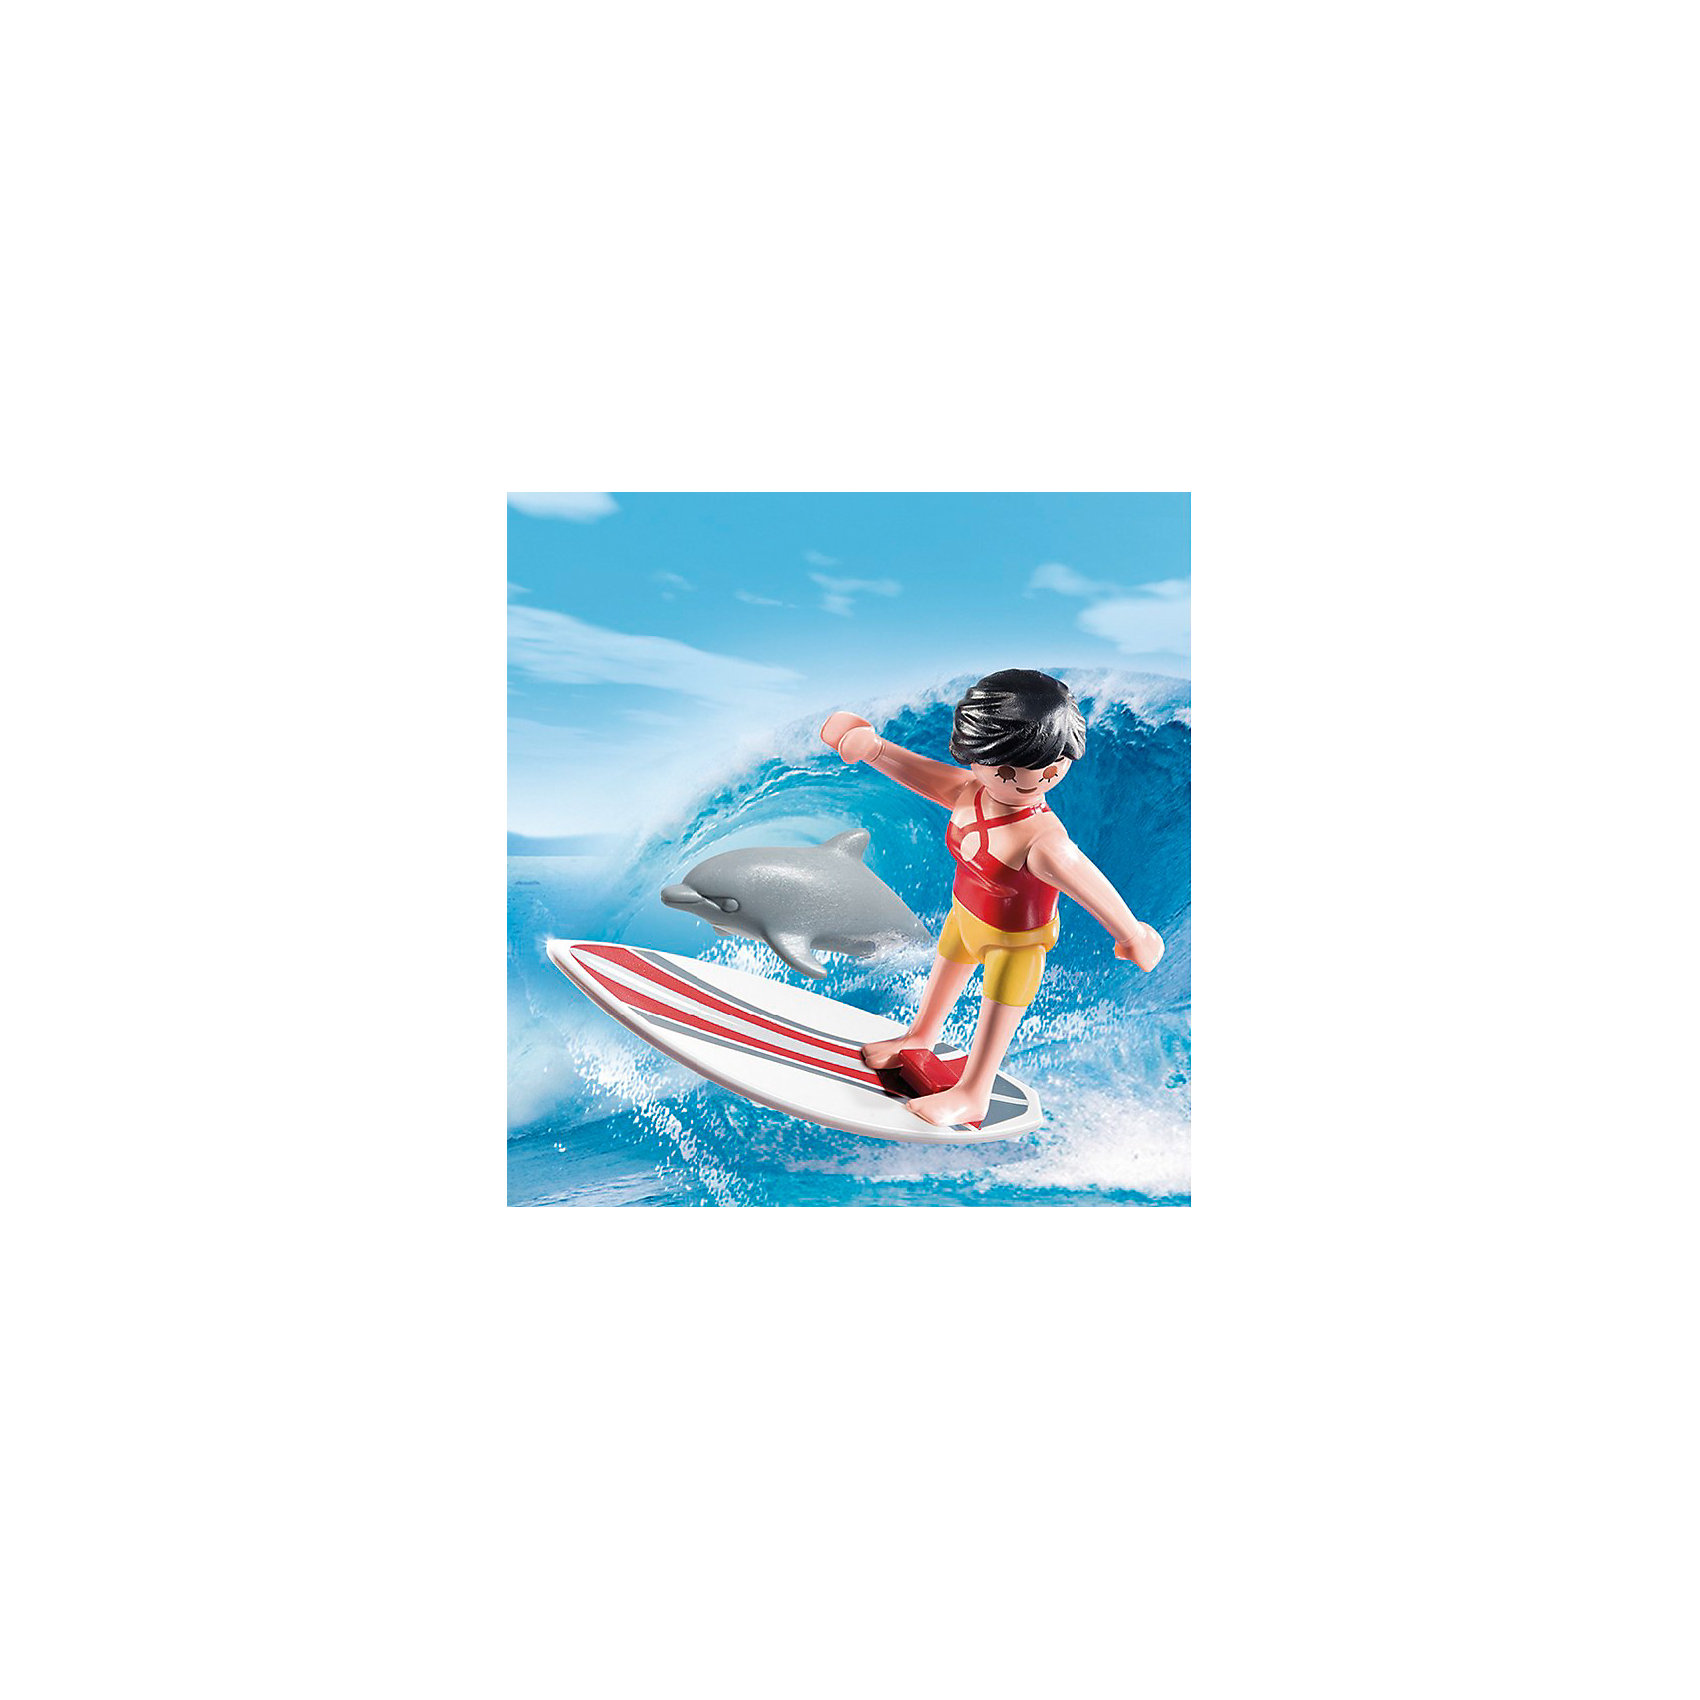 PLAYMOBIL® Экстра-набор: Сёрфингист с доской, PLAYMOBIL playmobil® экстра набор сёрфингист с доской playmobil